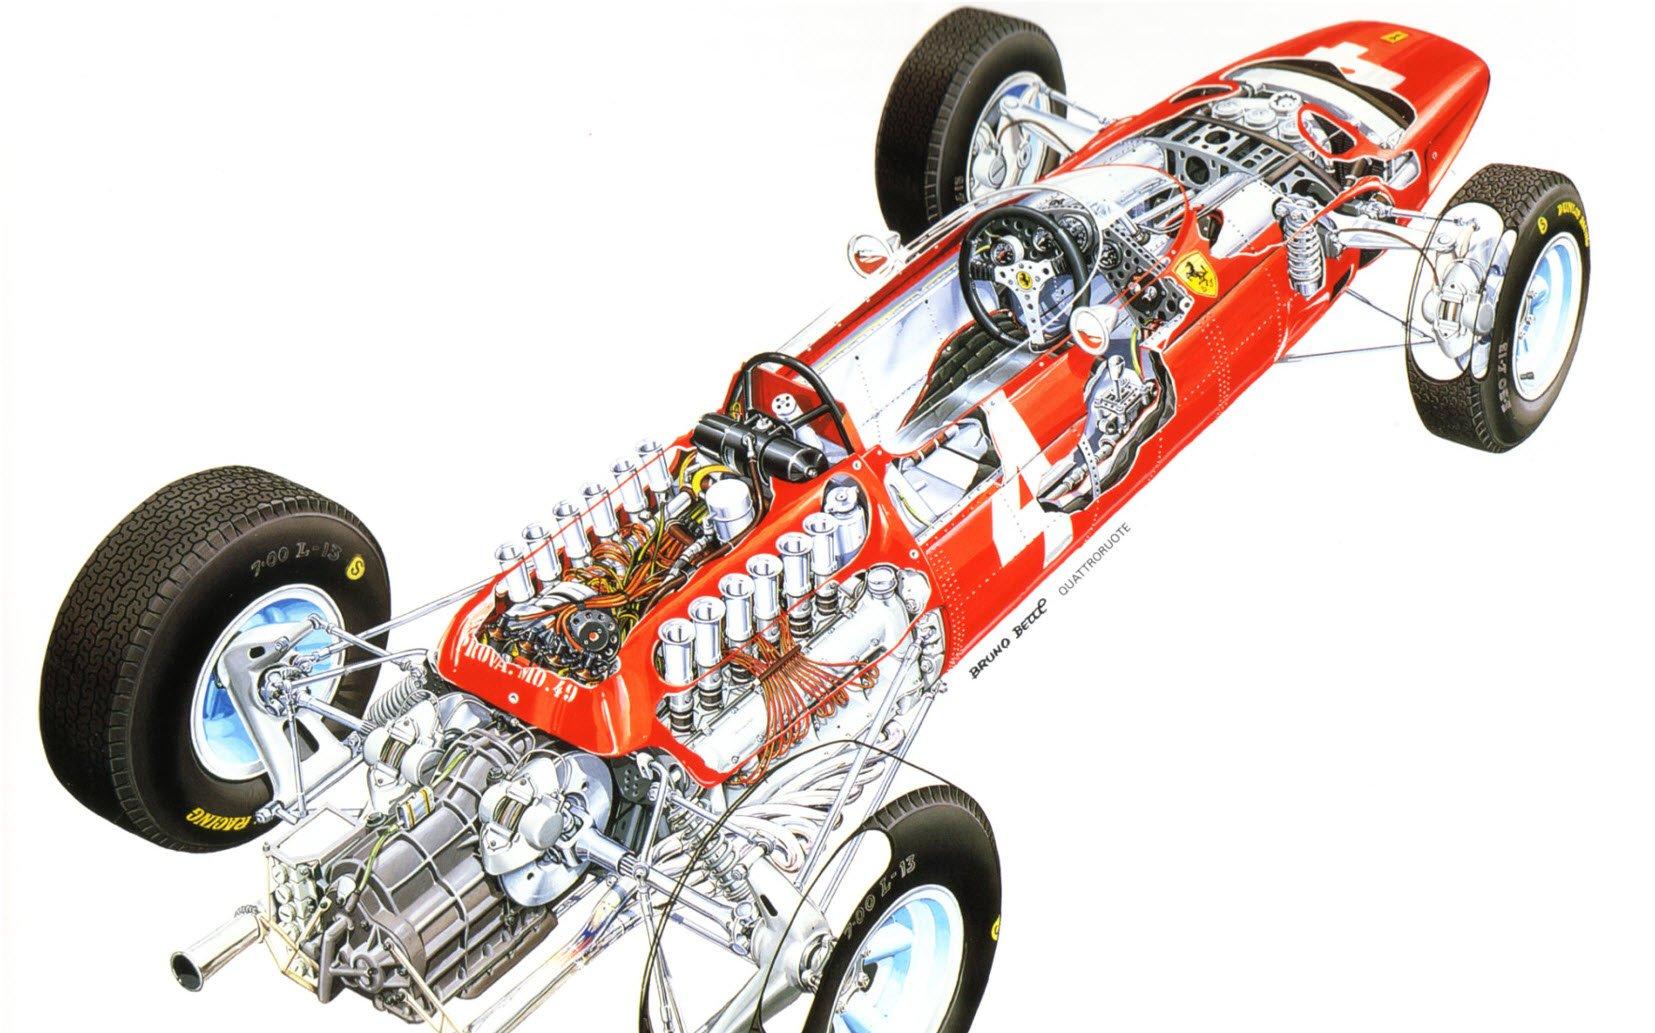 1964 Ferrari 158 Formula 1 Car